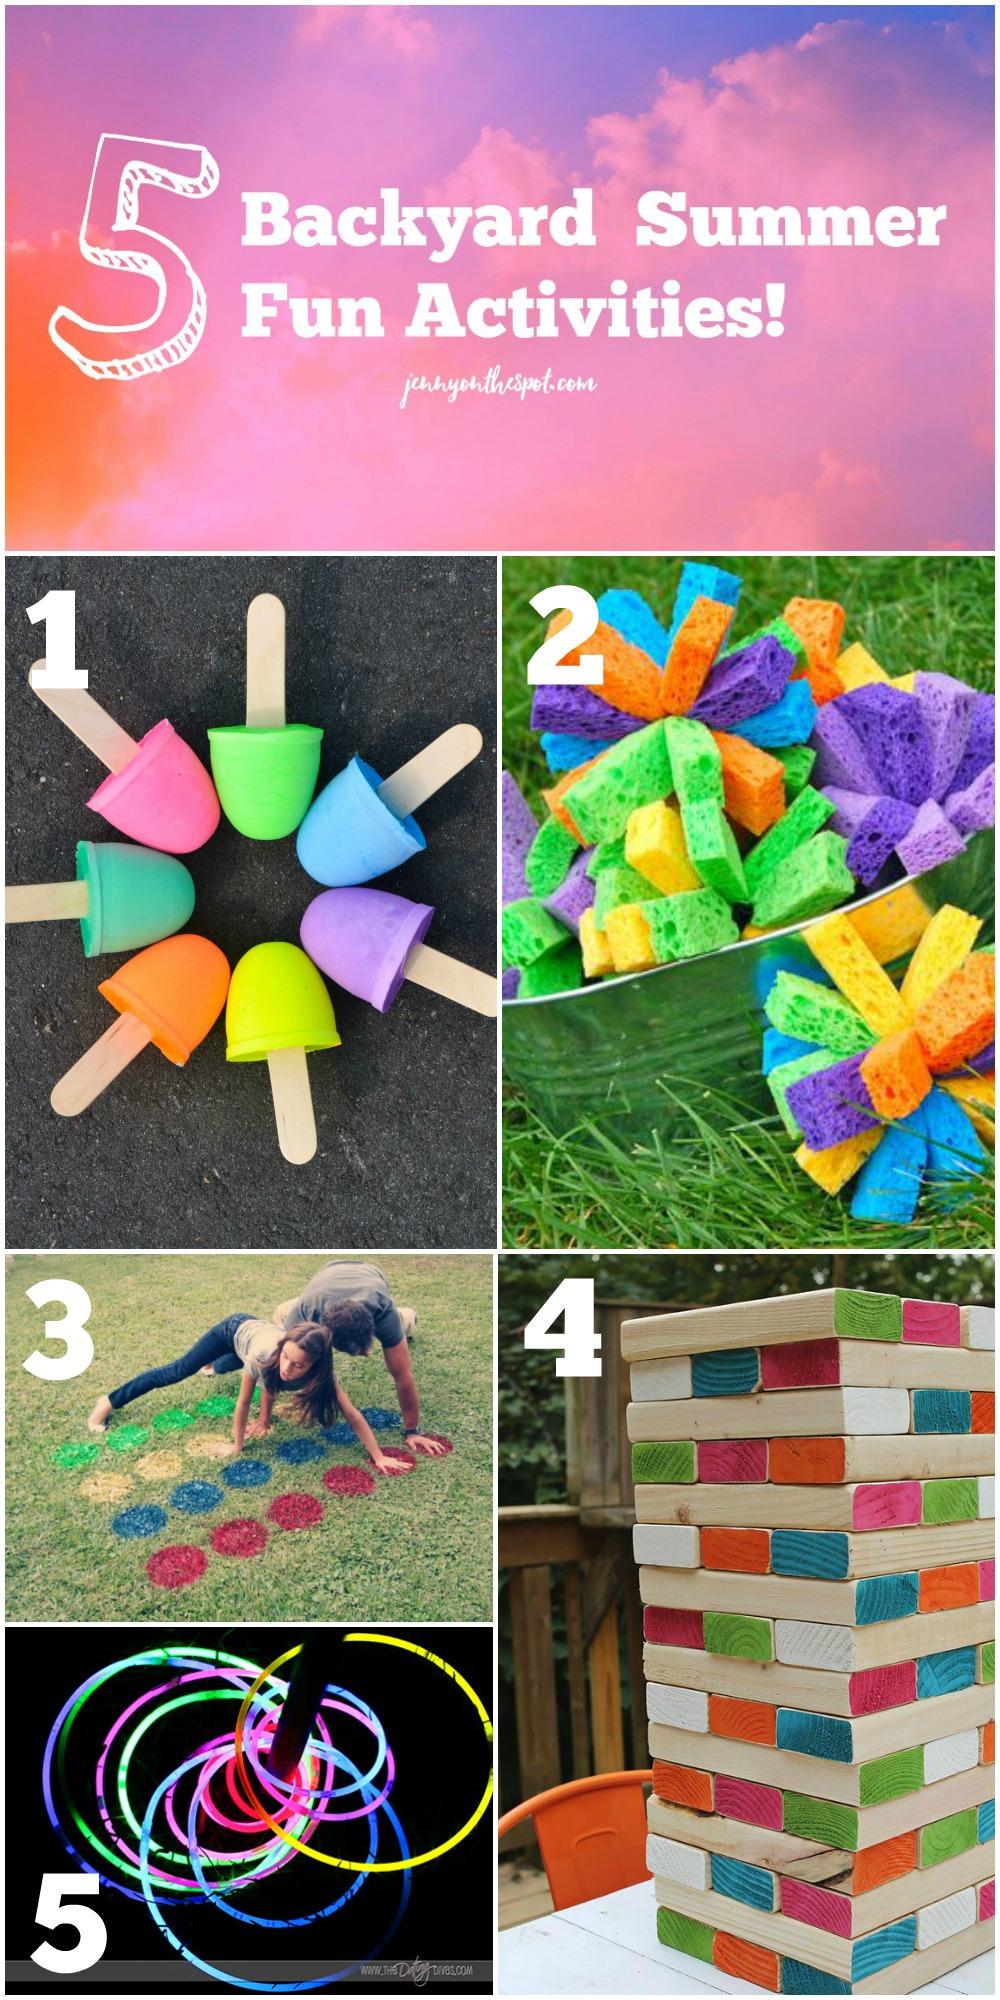 5 Backyard Summer Fun Activities (jennyonthespot.com)